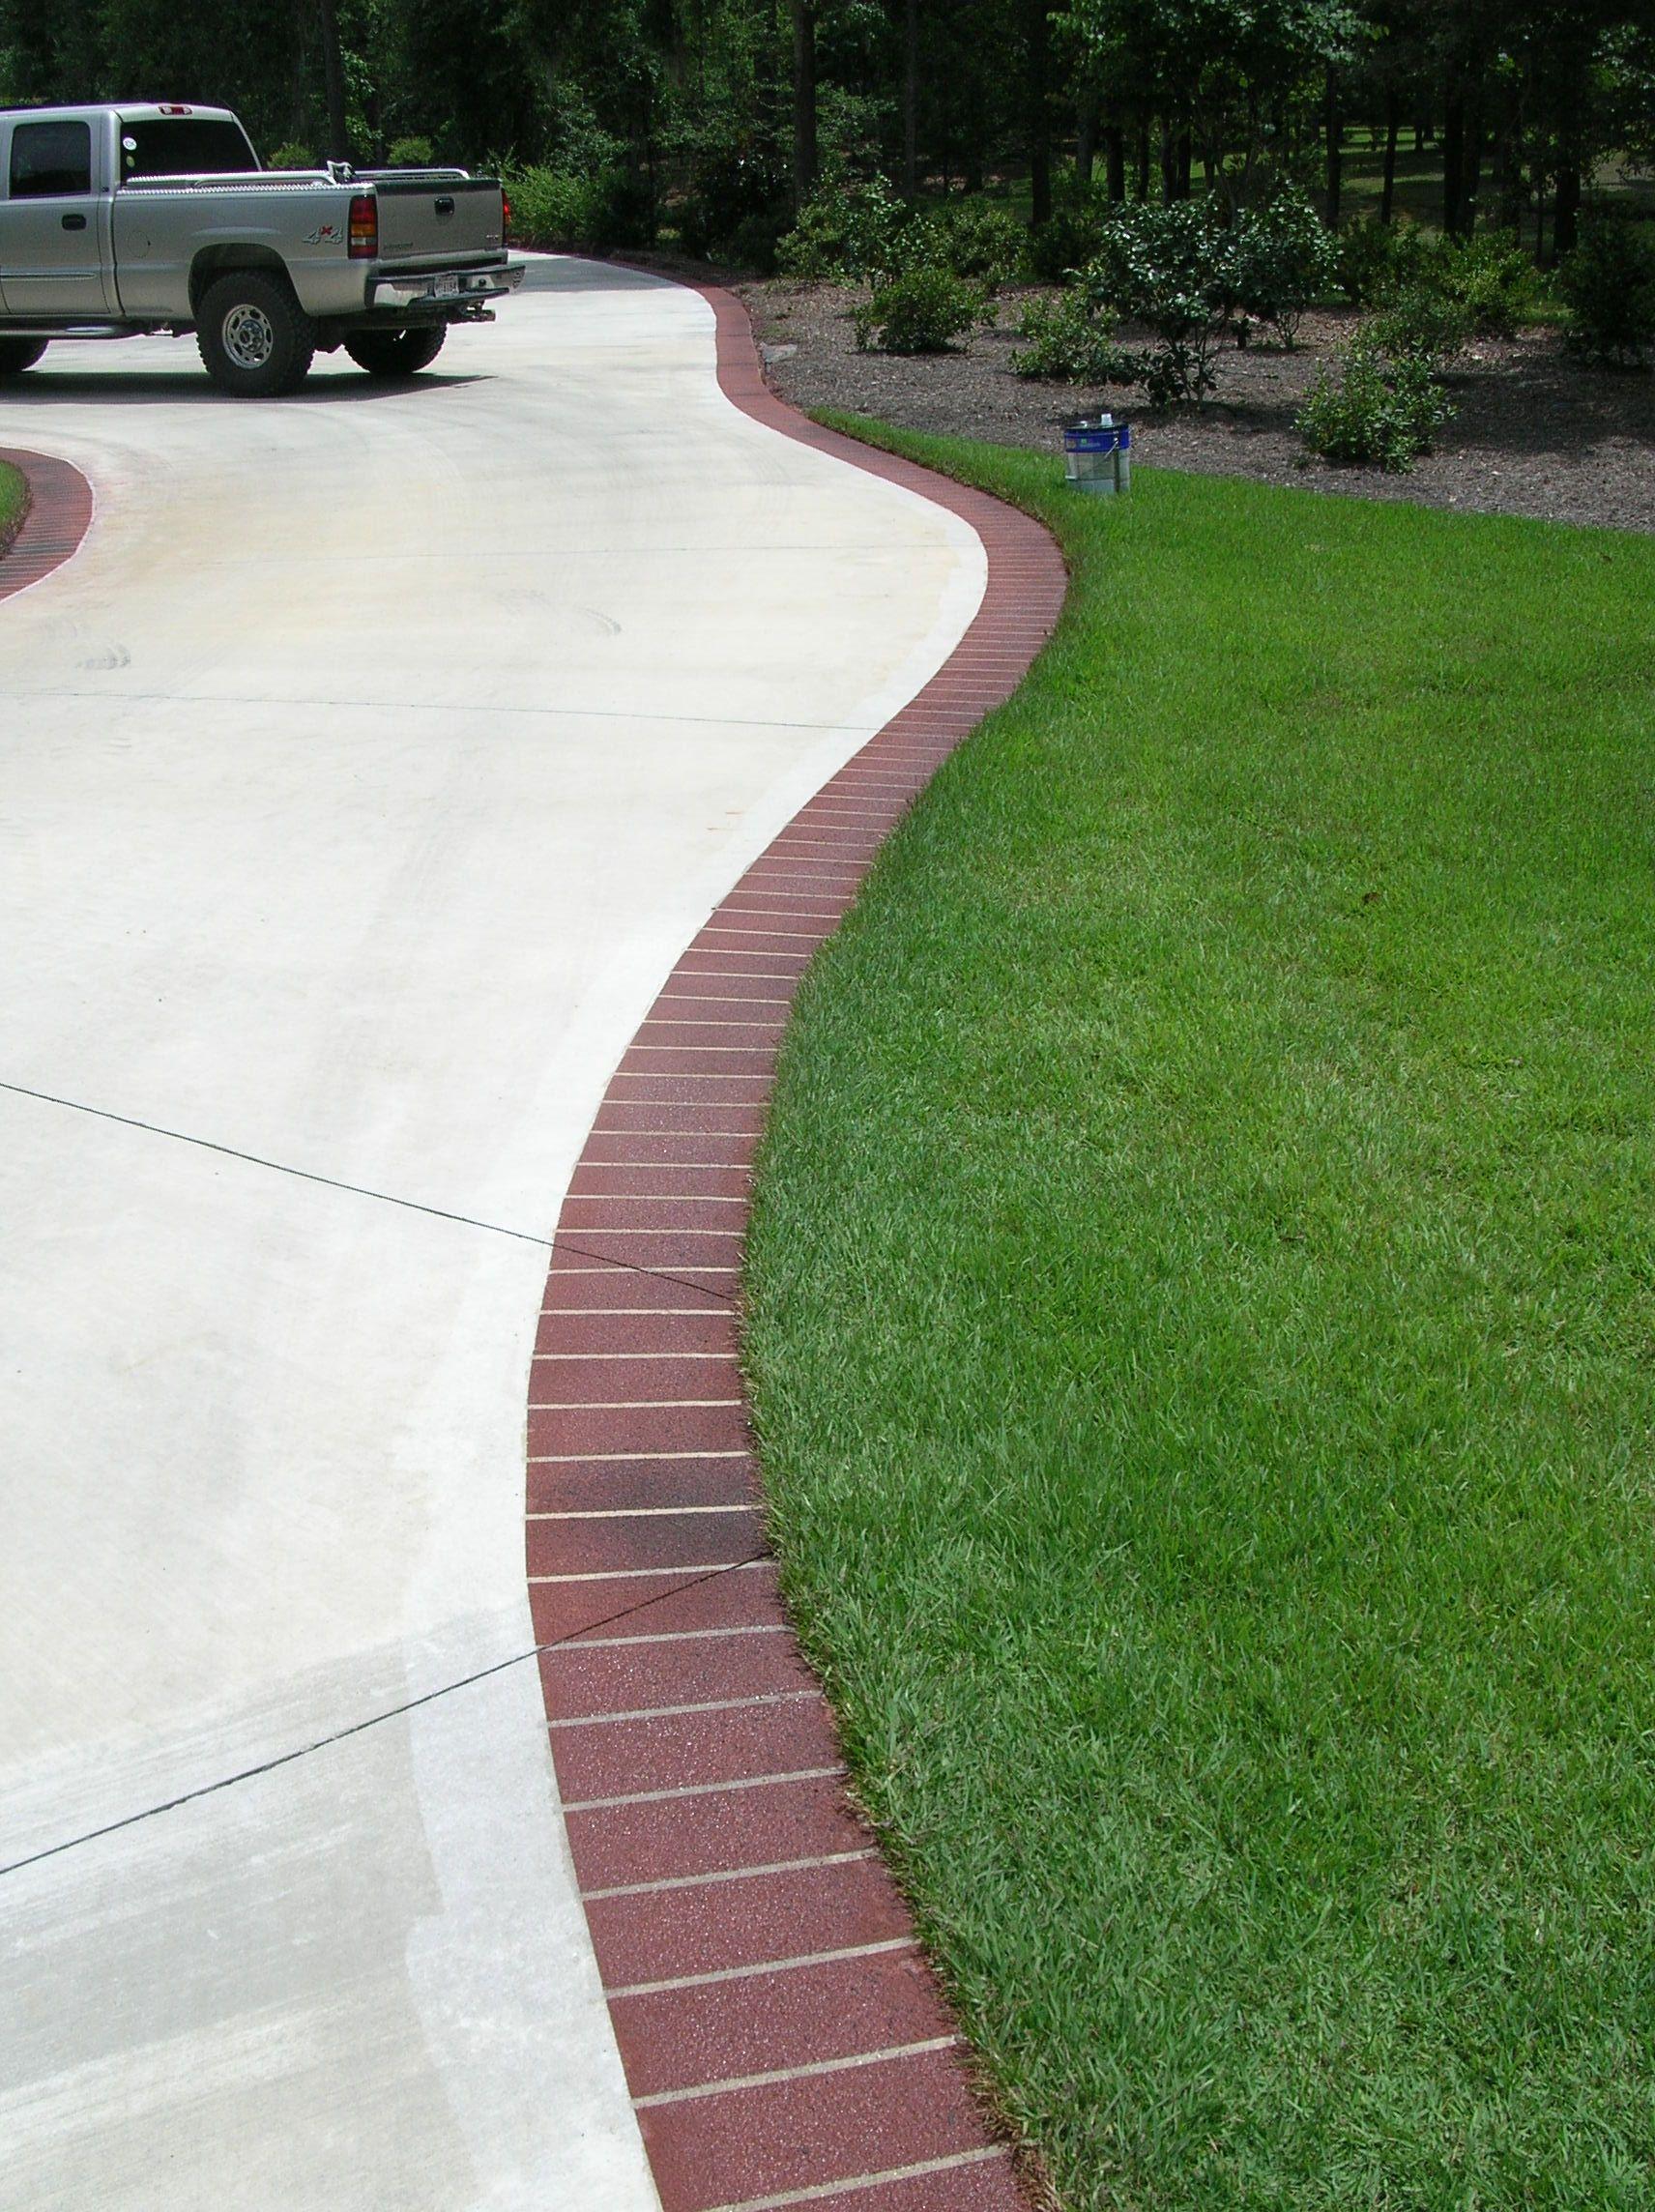 Brick Edging For The Driveway Driveway Design Brick Edging